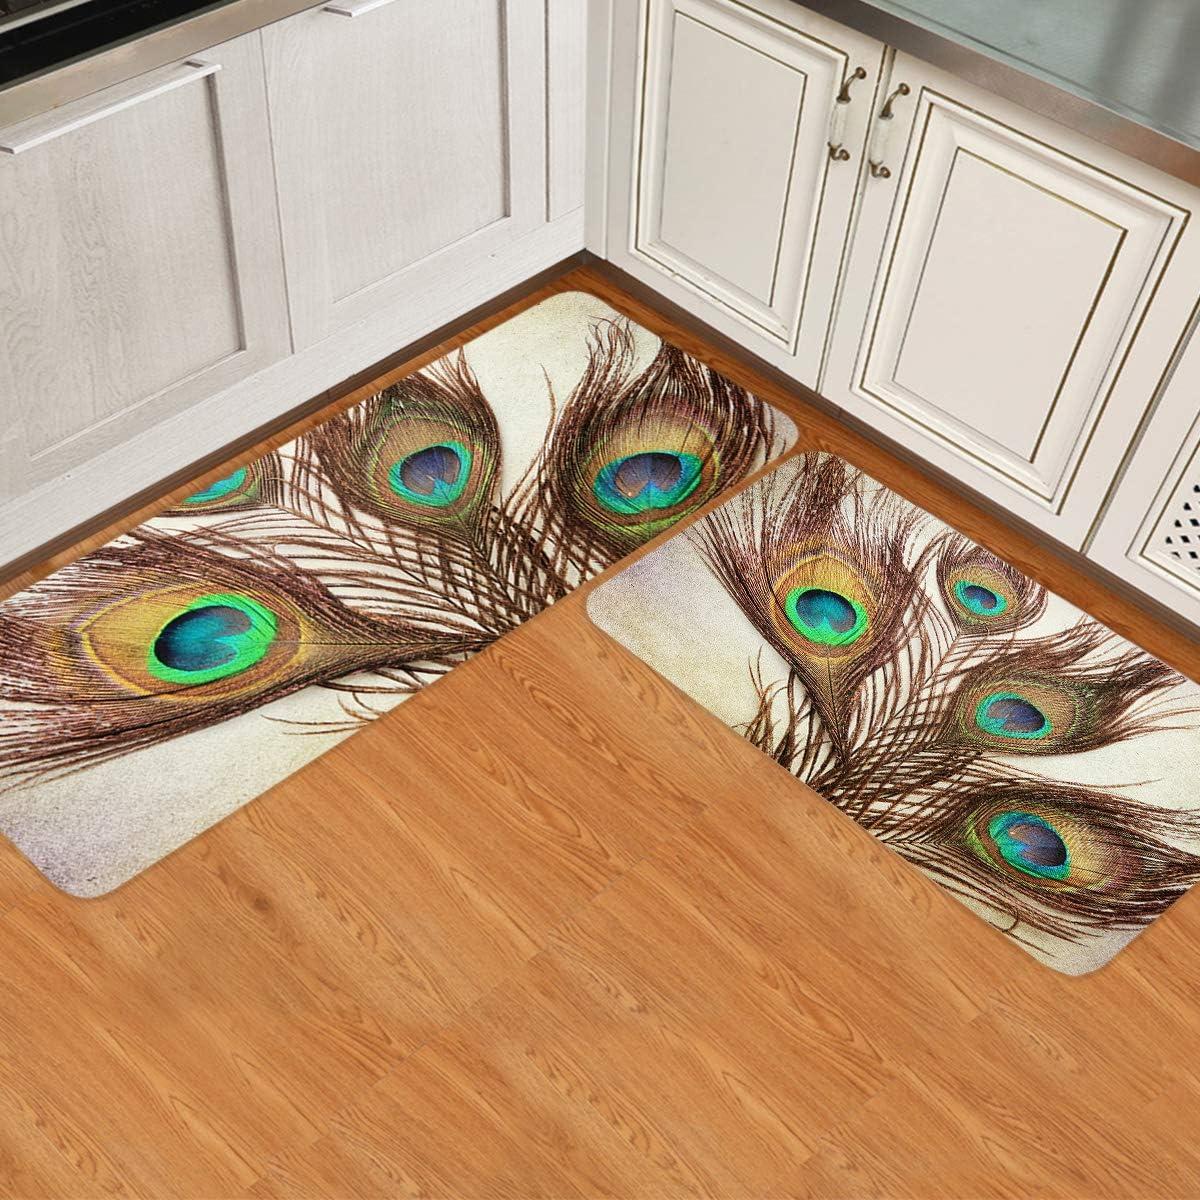 Olivefox Non-Slip Memphis Mall Bargain Modern 2 Pieces for Decor Mats Laundry Kitchen